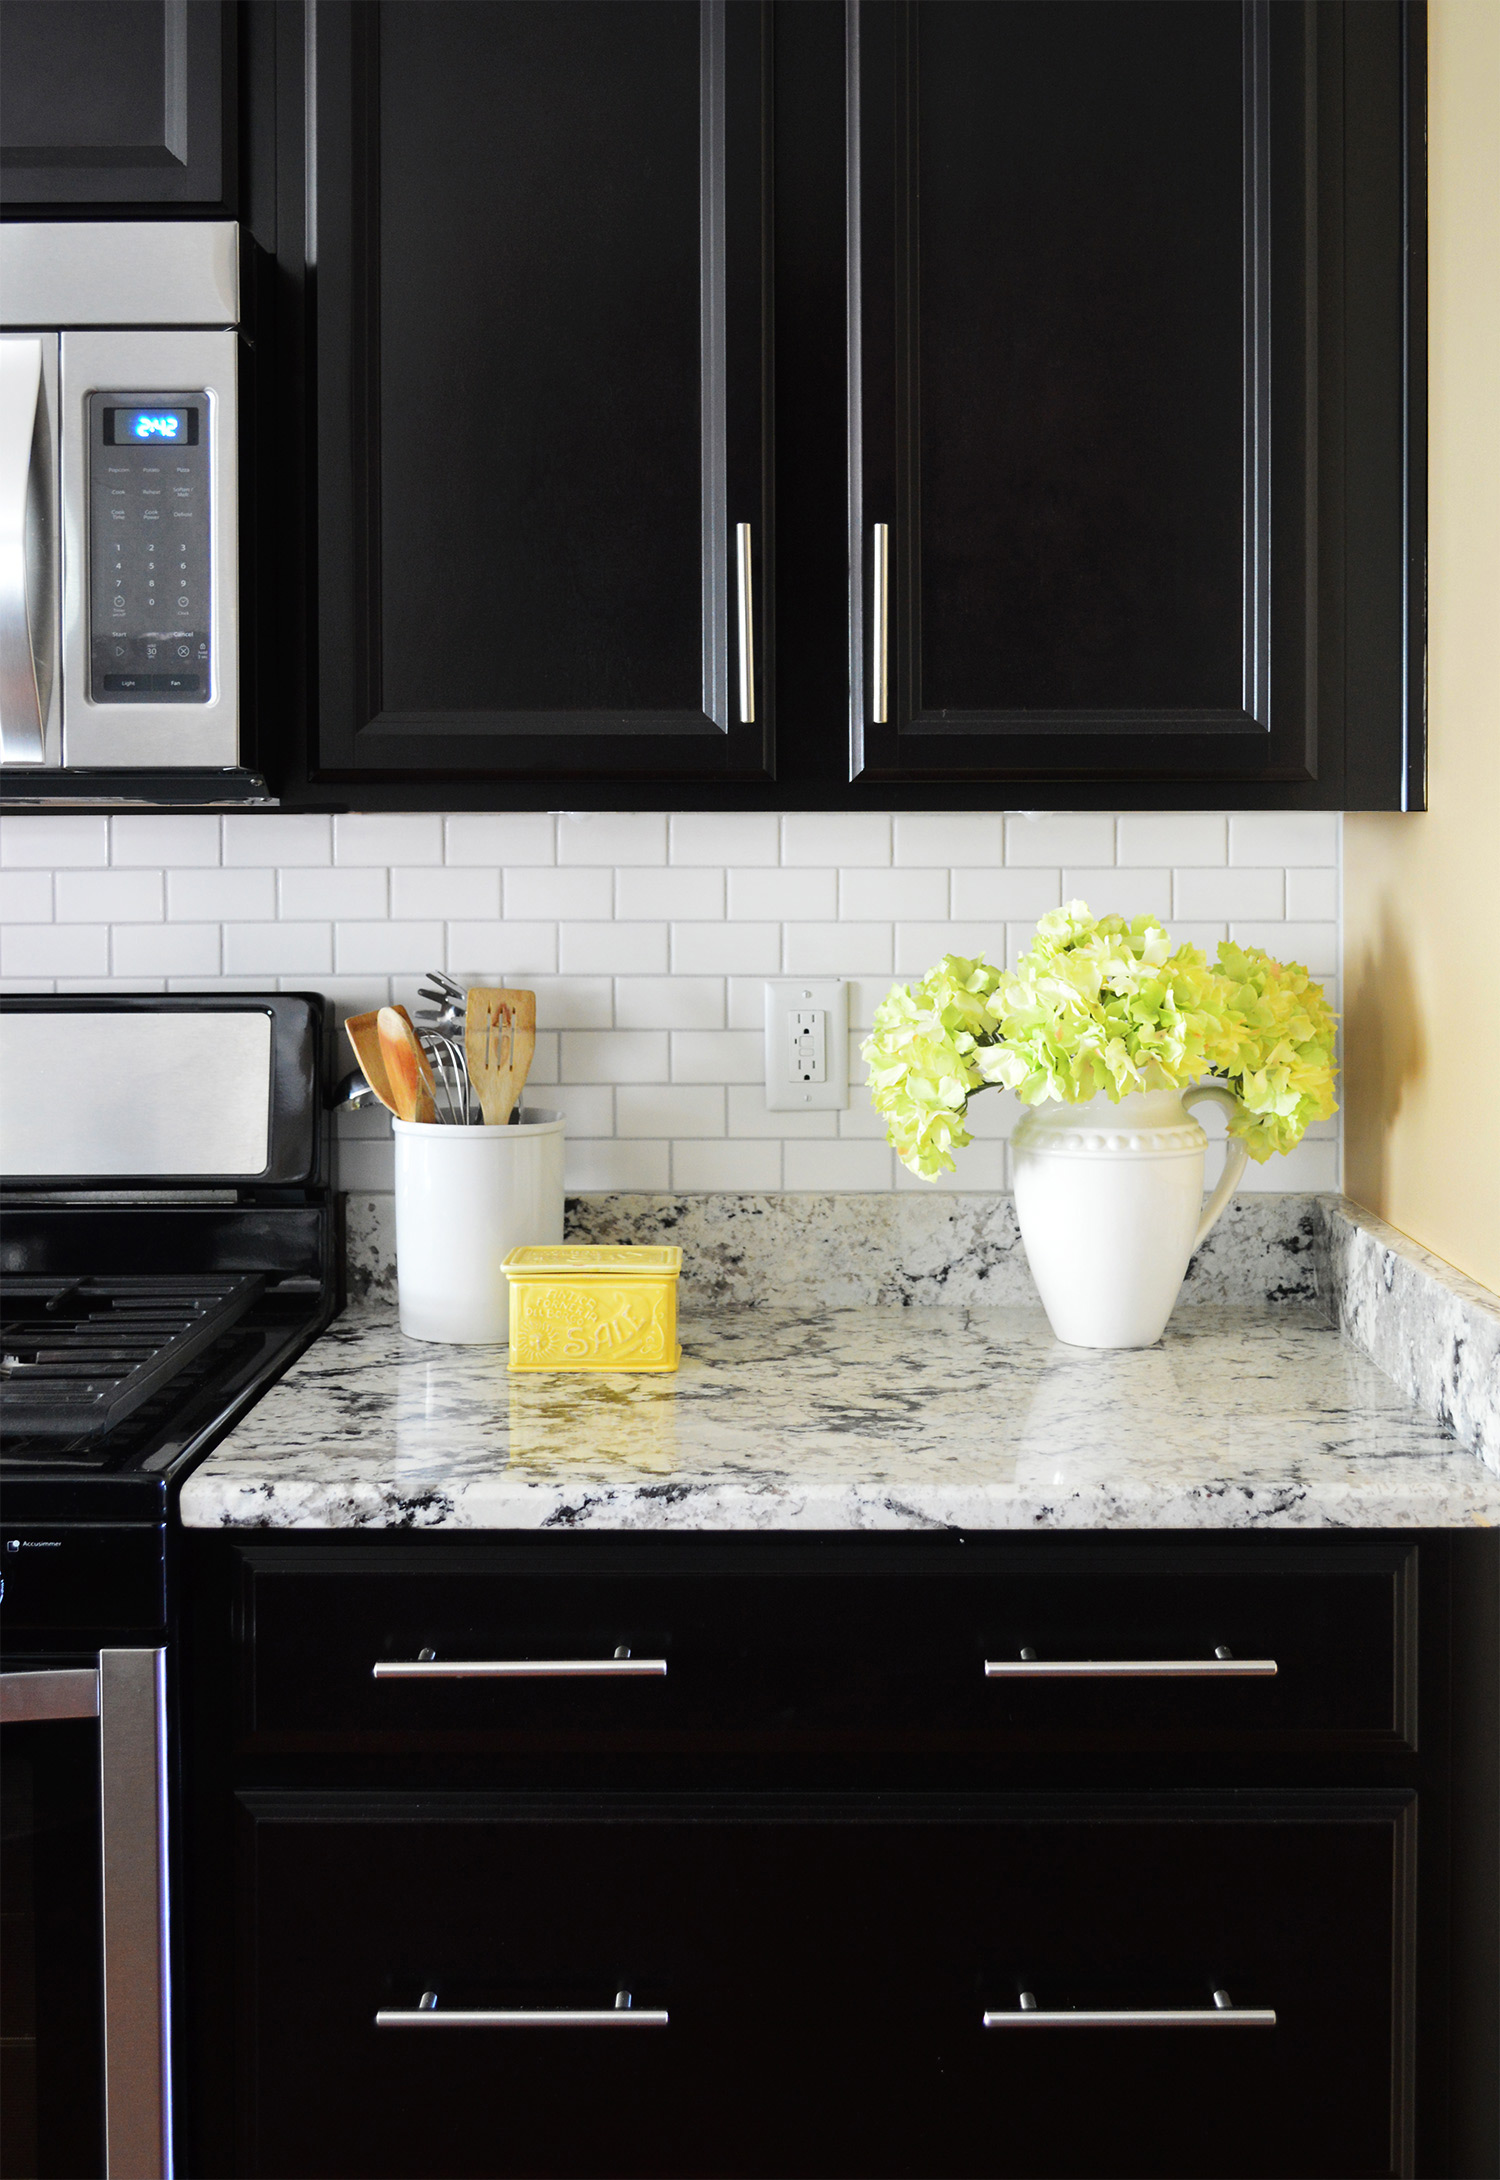 How-to-tile-a-backsplash-pics-info-even-a-video-wallpaper-wp4005382-1